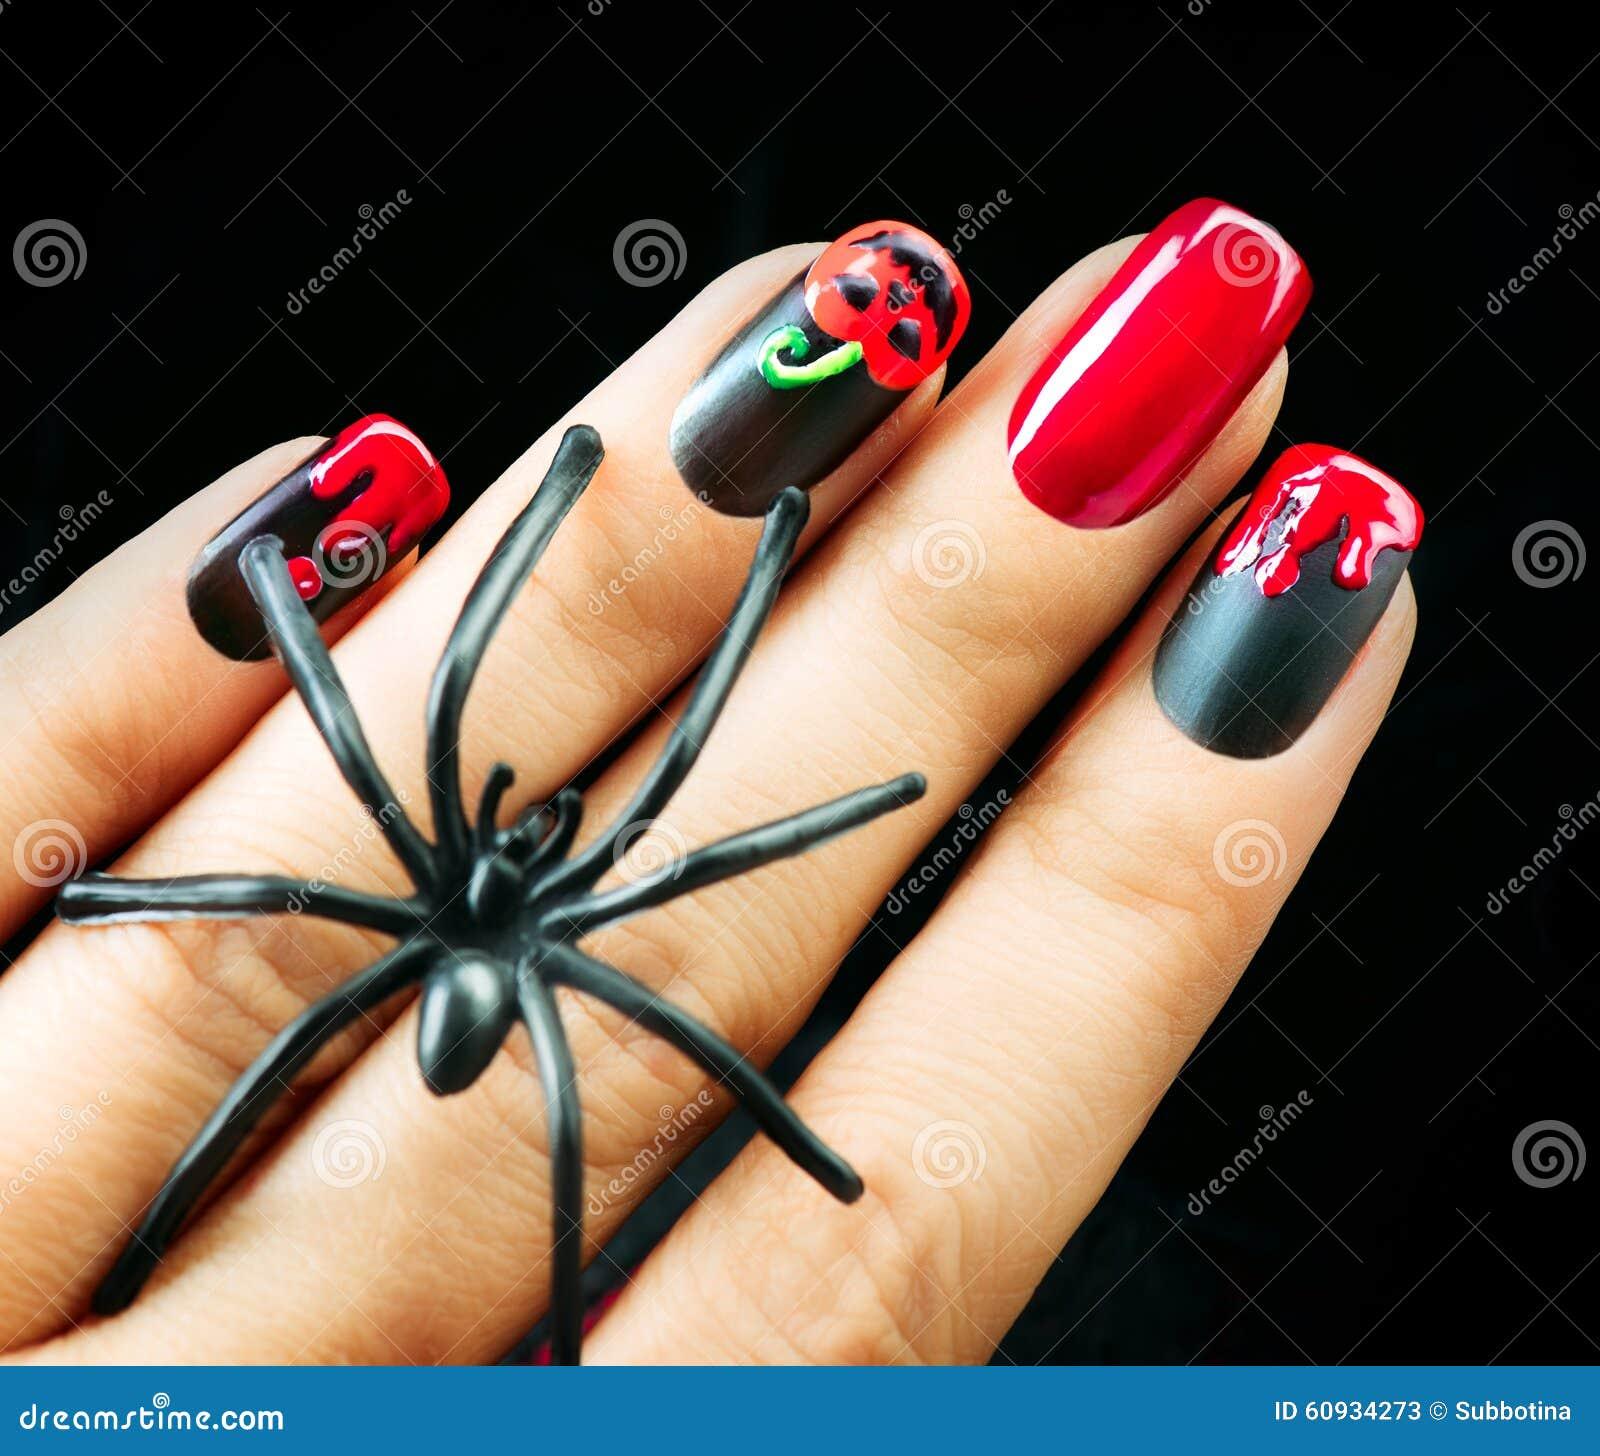 Halloween Nail Art Design. Black Matte Polish Stock Image - Image of ...